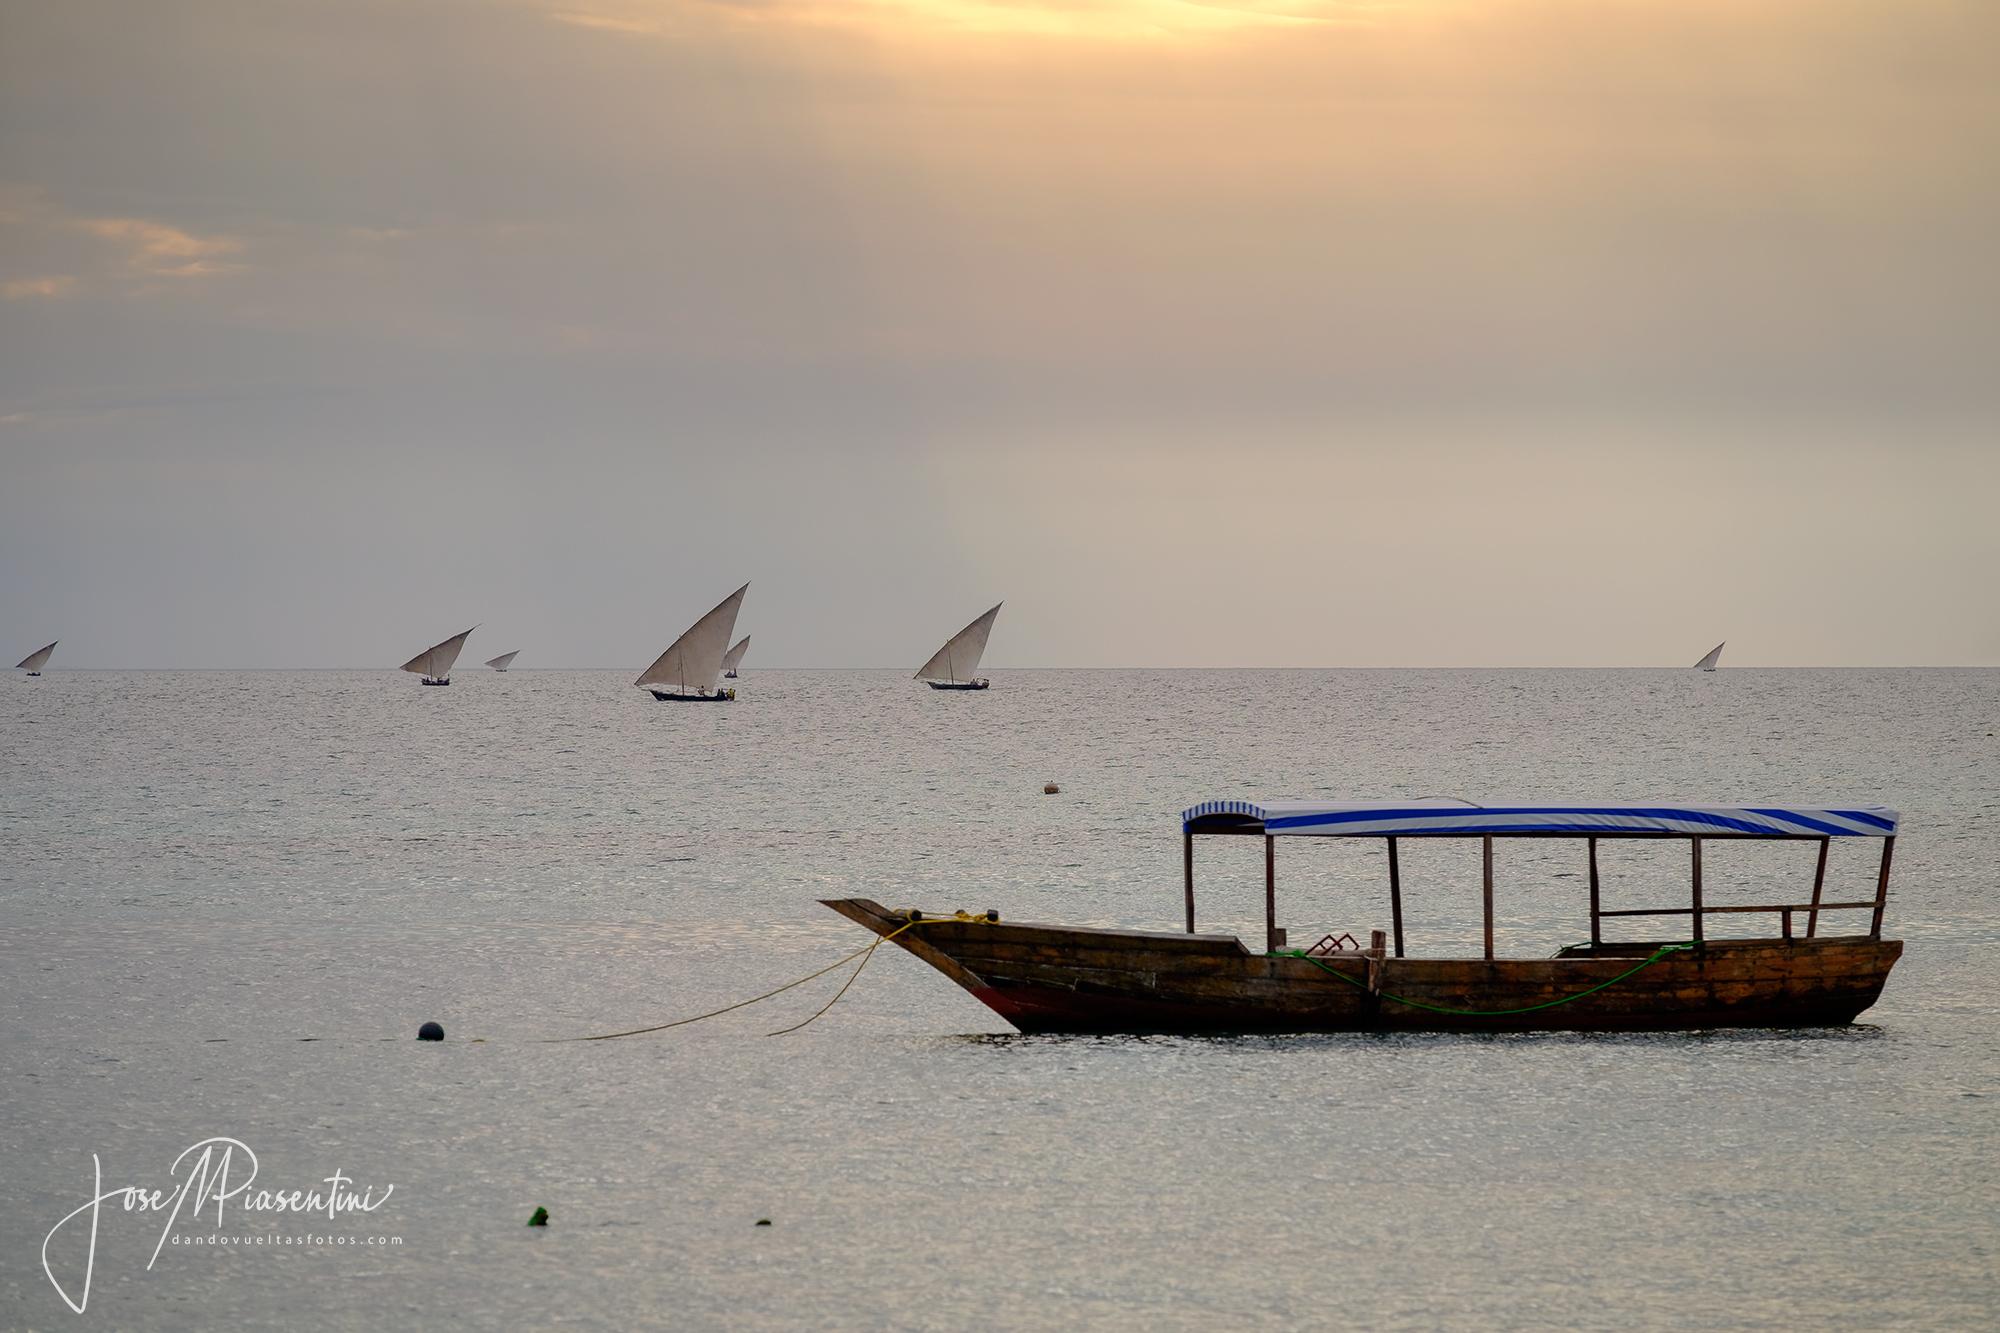 Fisherman dhow zanzibar